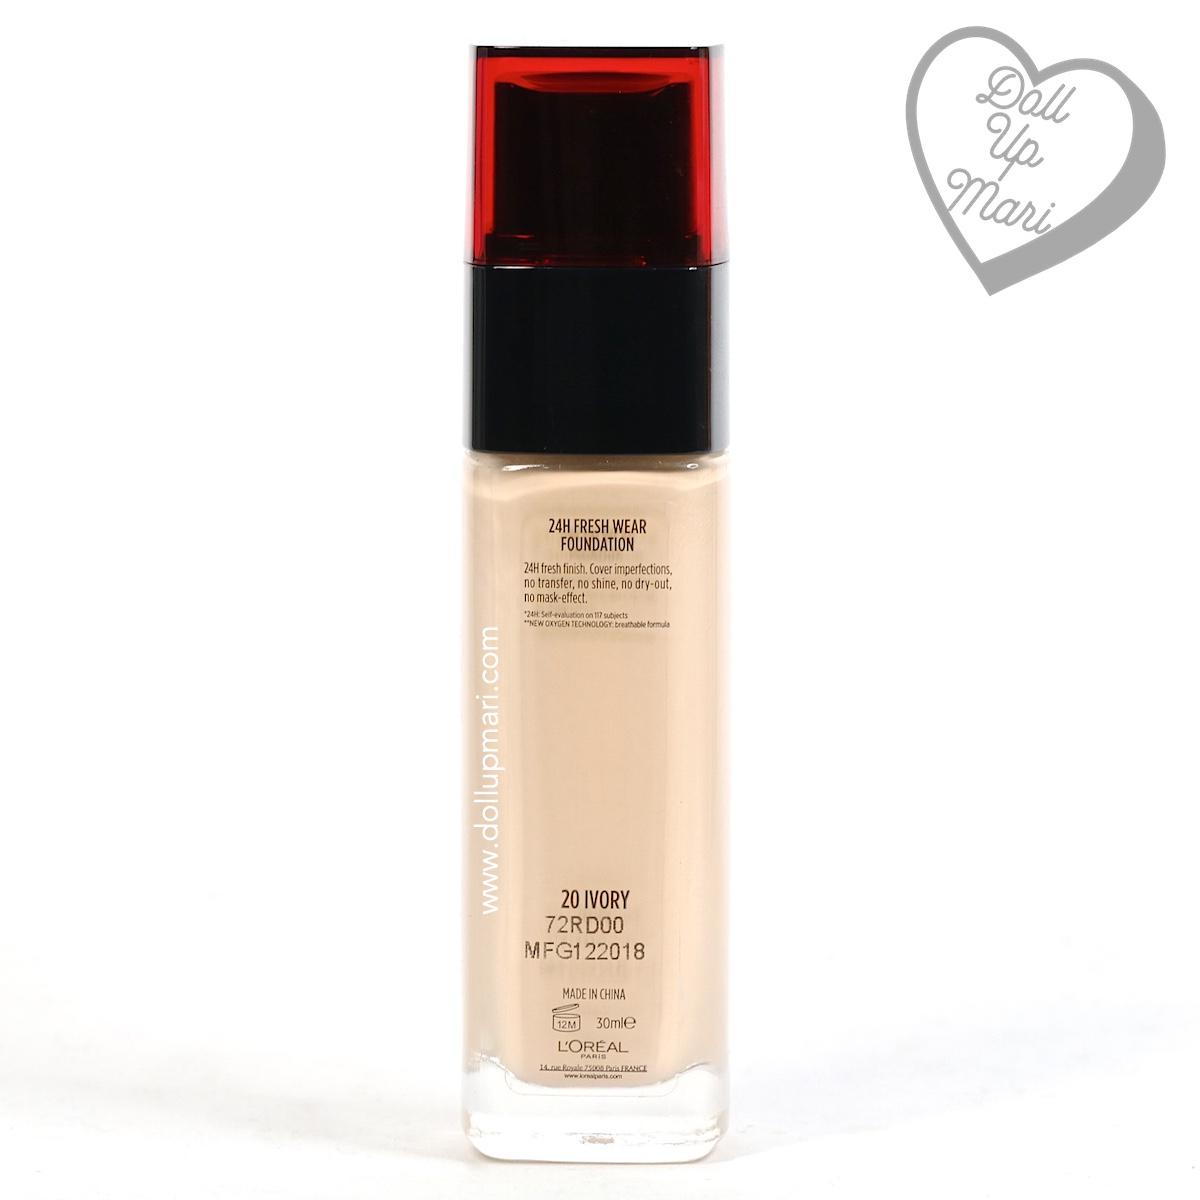 Bottle rear of L'Oréal Paris Infallible 24HR Fresh Wear Liquid Foundation SPF25PA+++ in shade Ivory